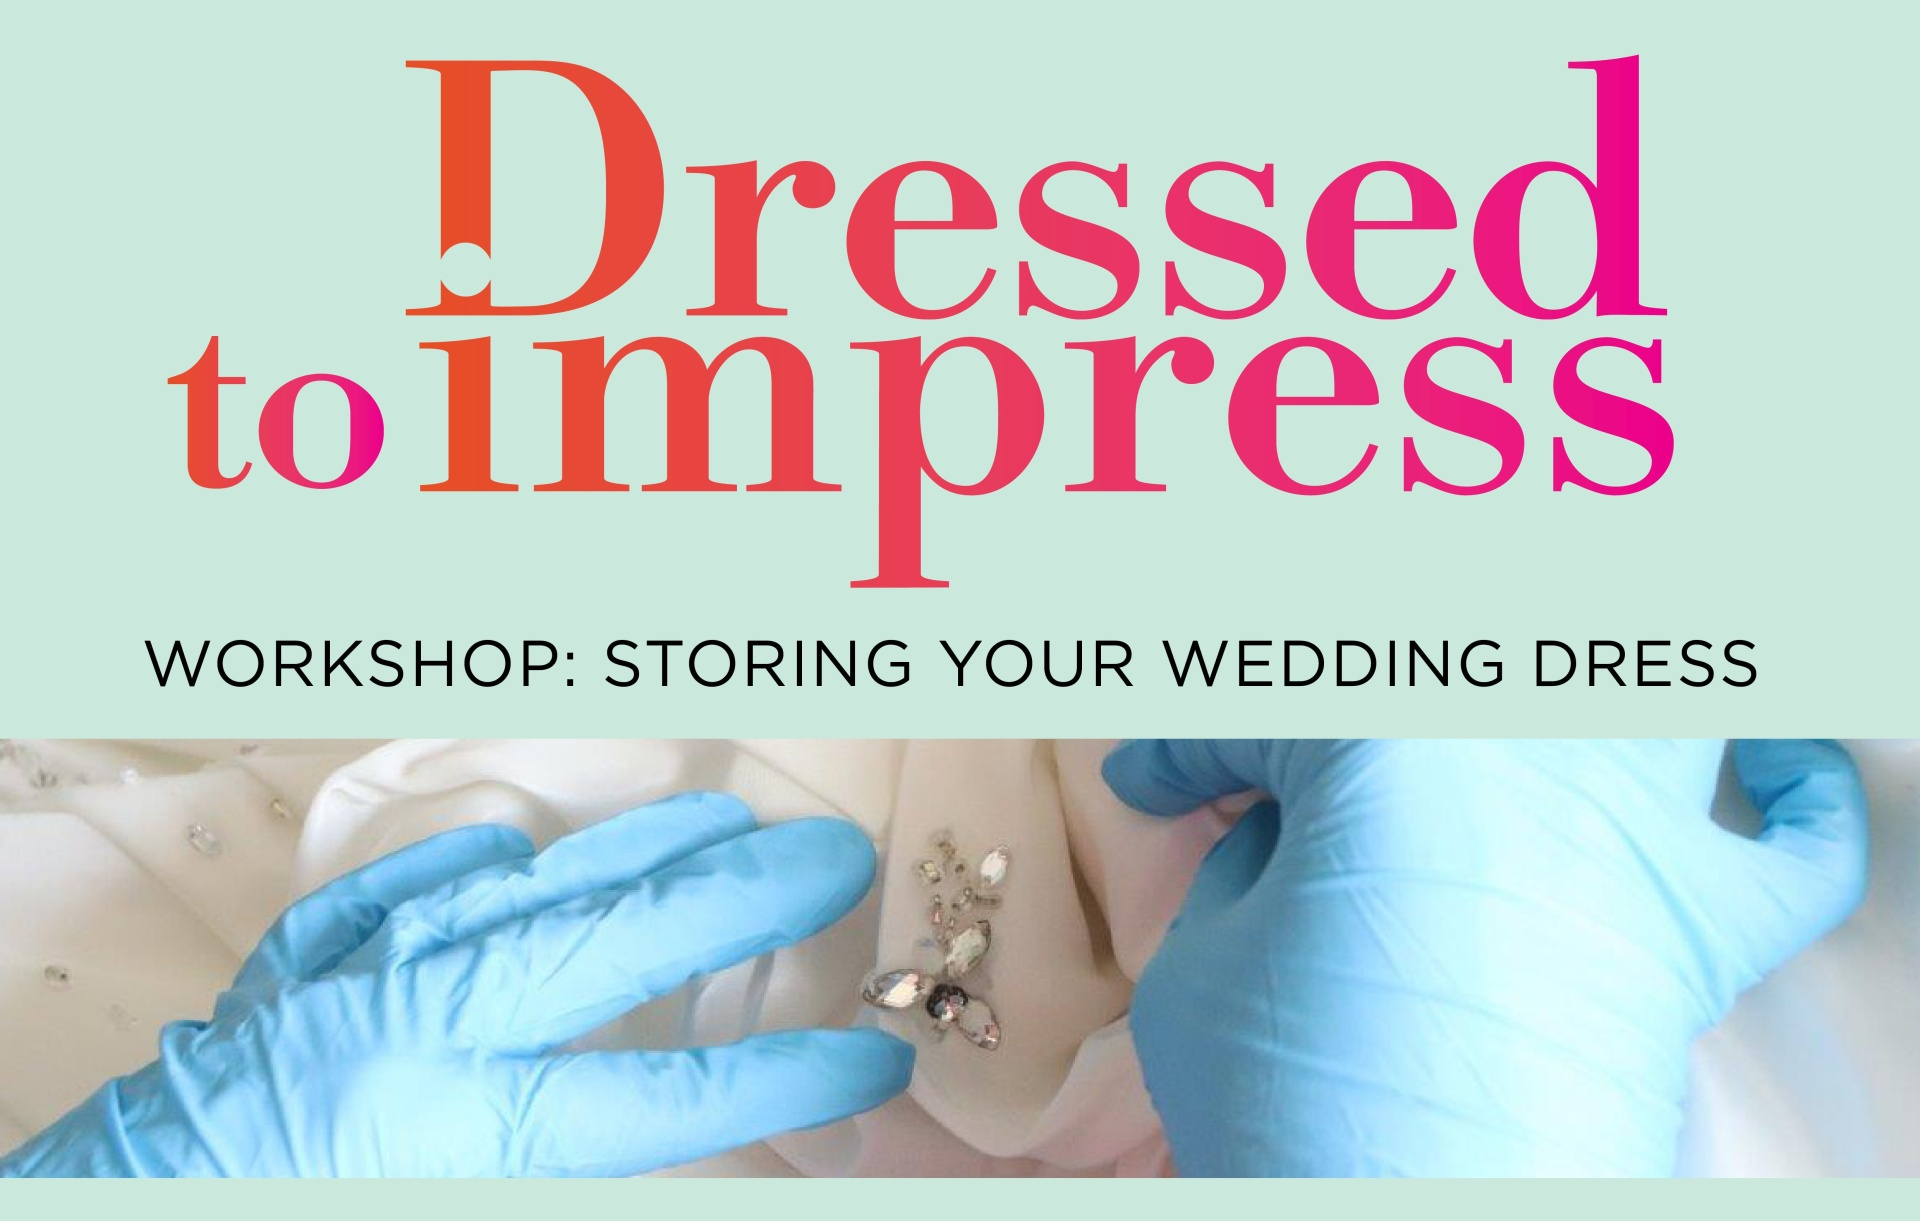 37f0a77cad6 Cairns Events - Event Details - Dressed to Impress Workshop  Storing Your Wedding  Dress